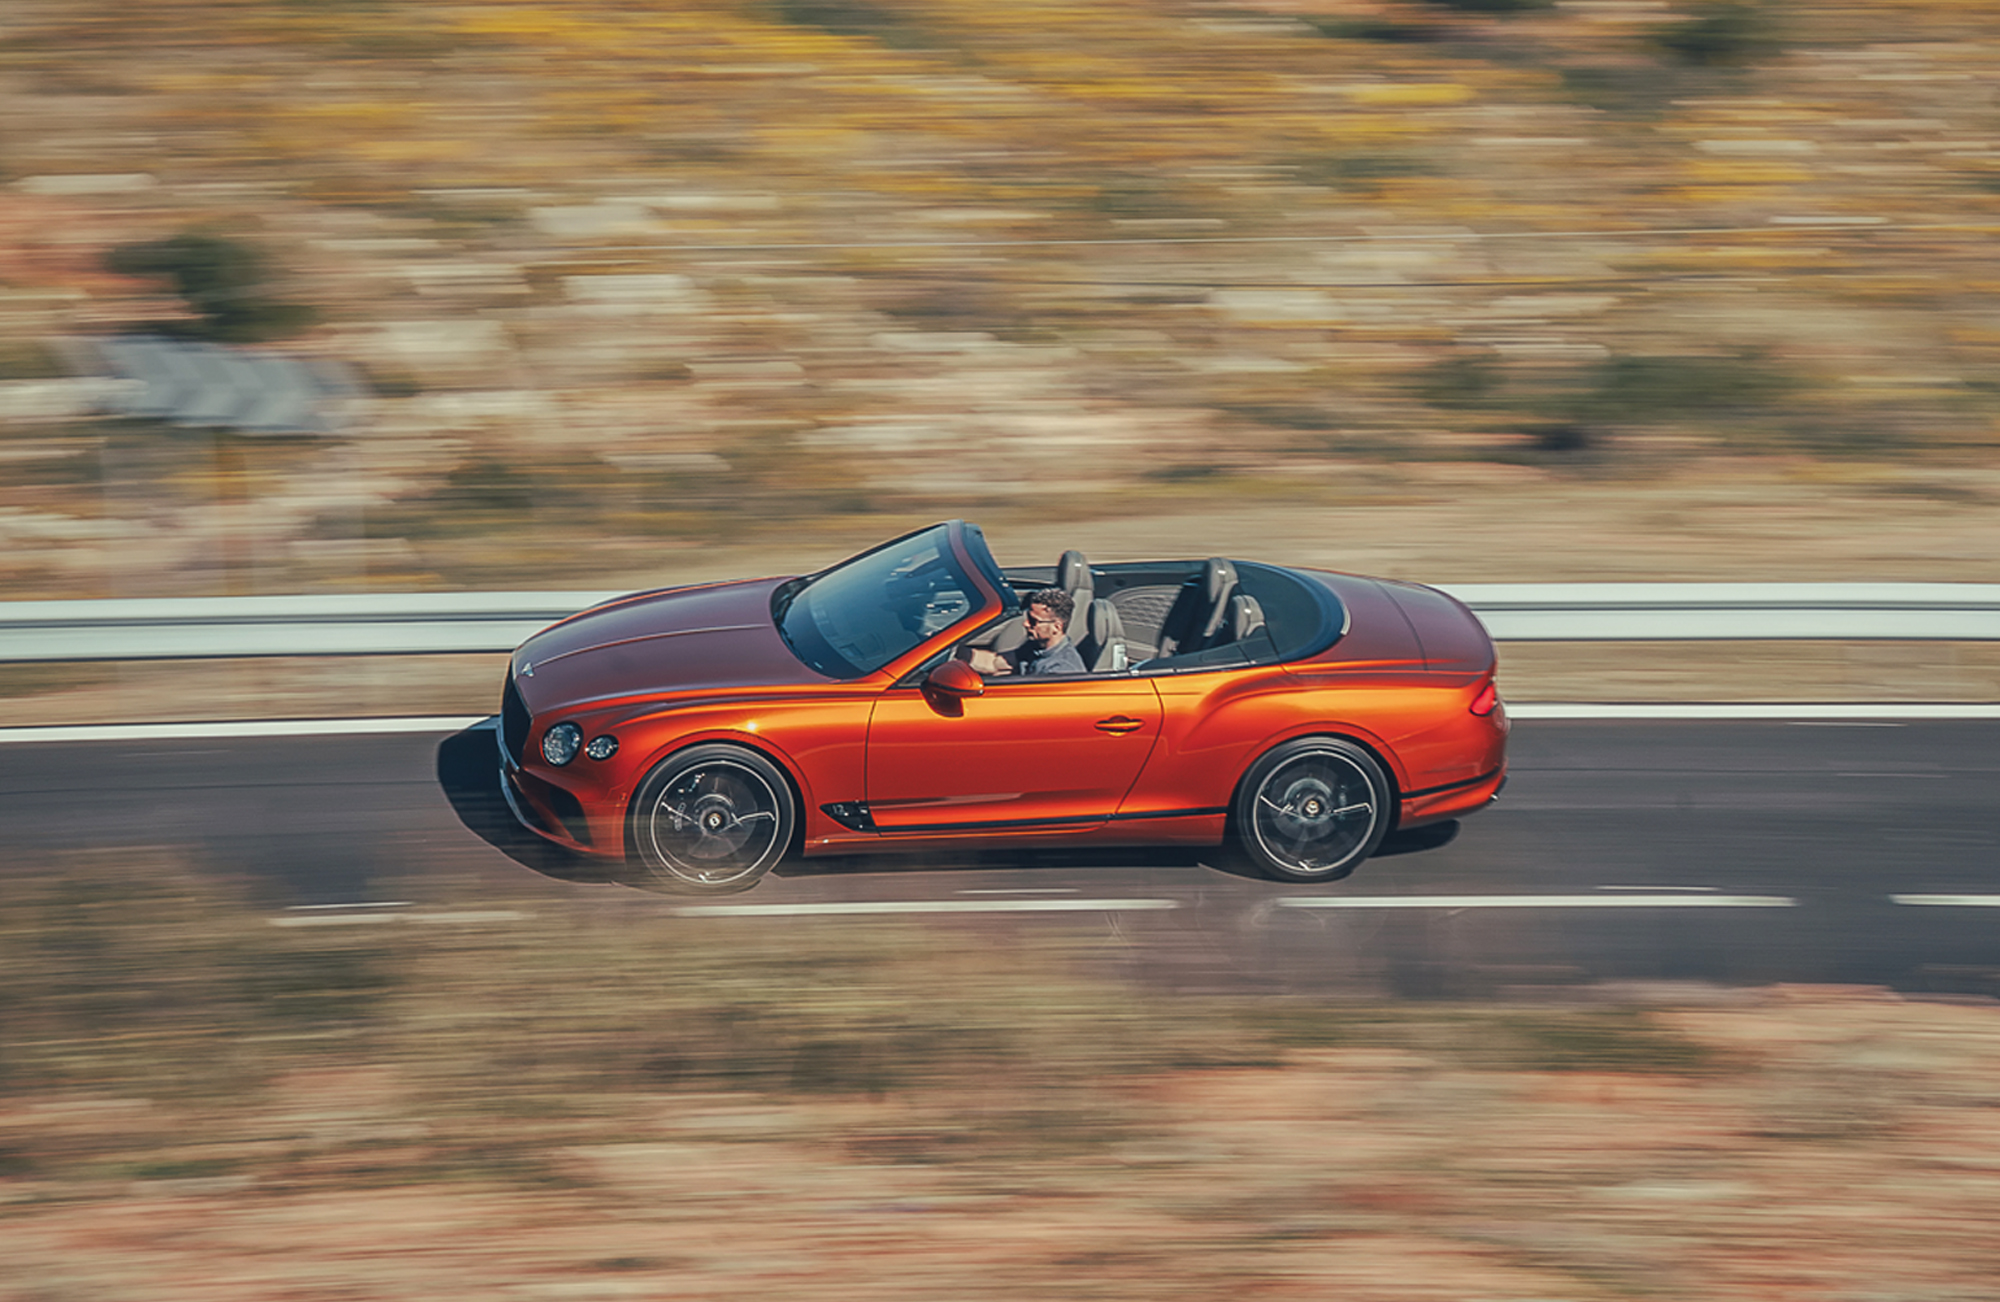 RP - Orange Flame-14 copy.jpg